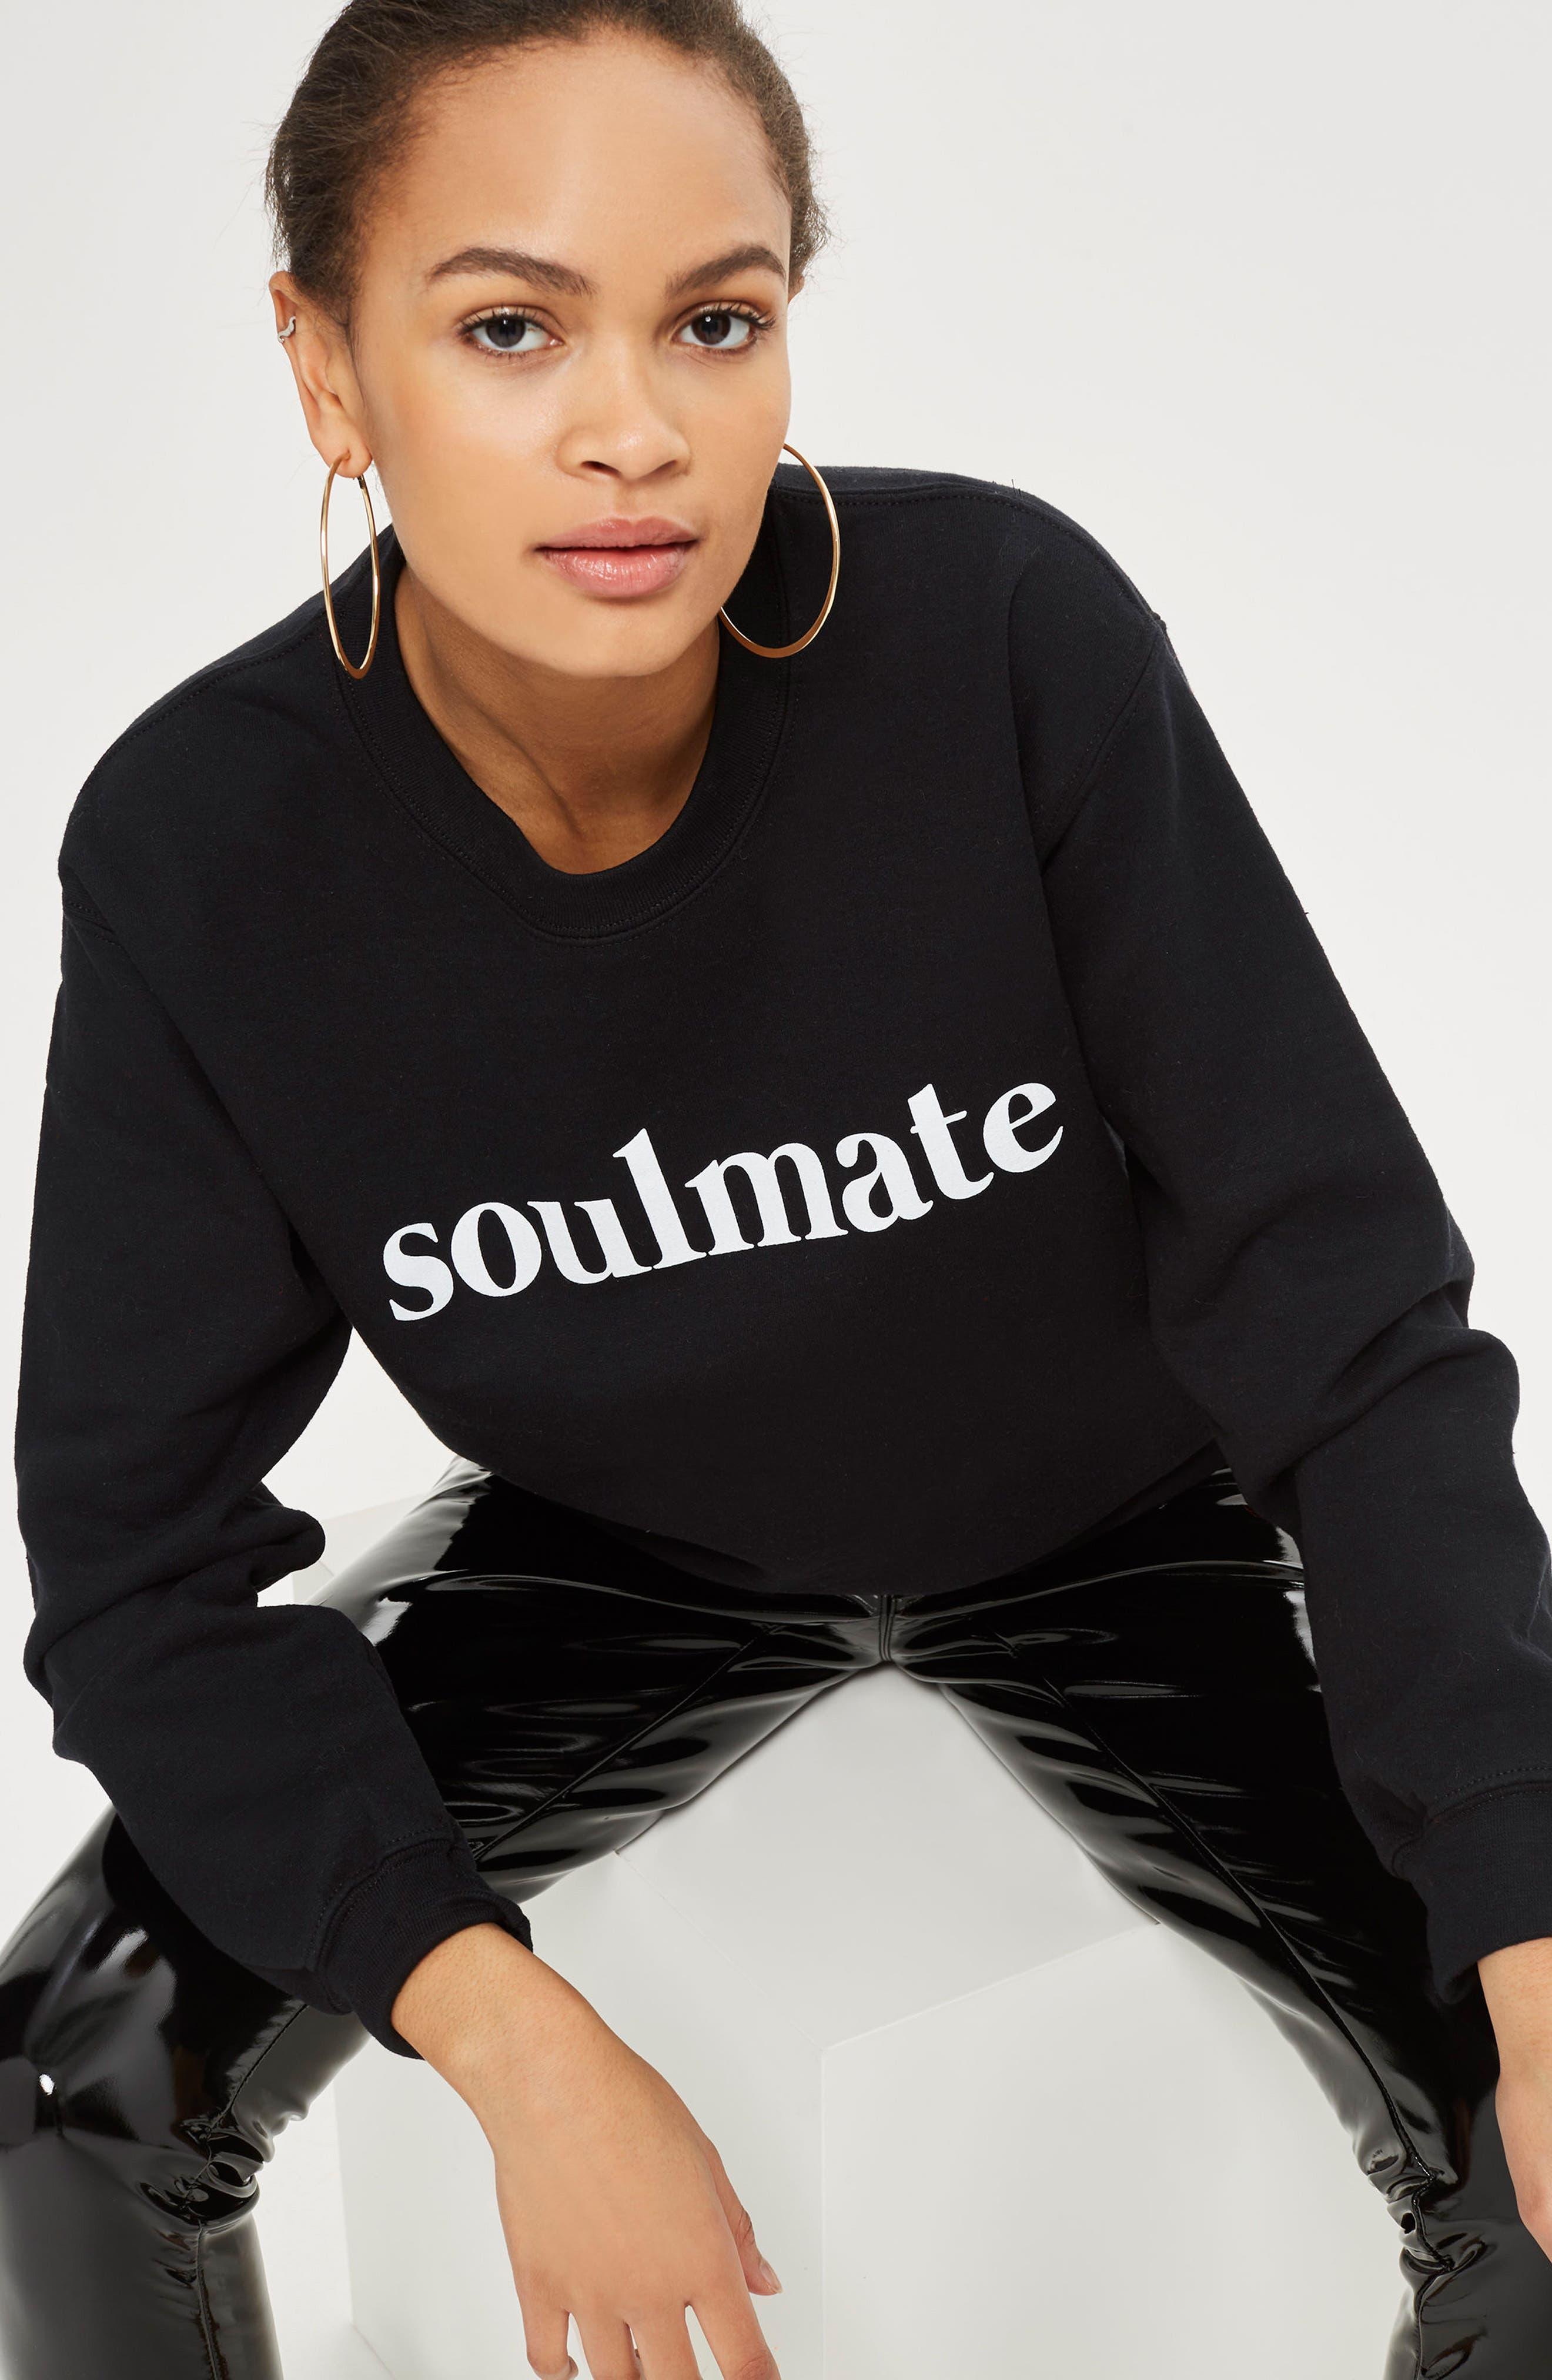 Soulmate Graphic Sweatshirt,                             Alternate thumbnail 4, color,                             001